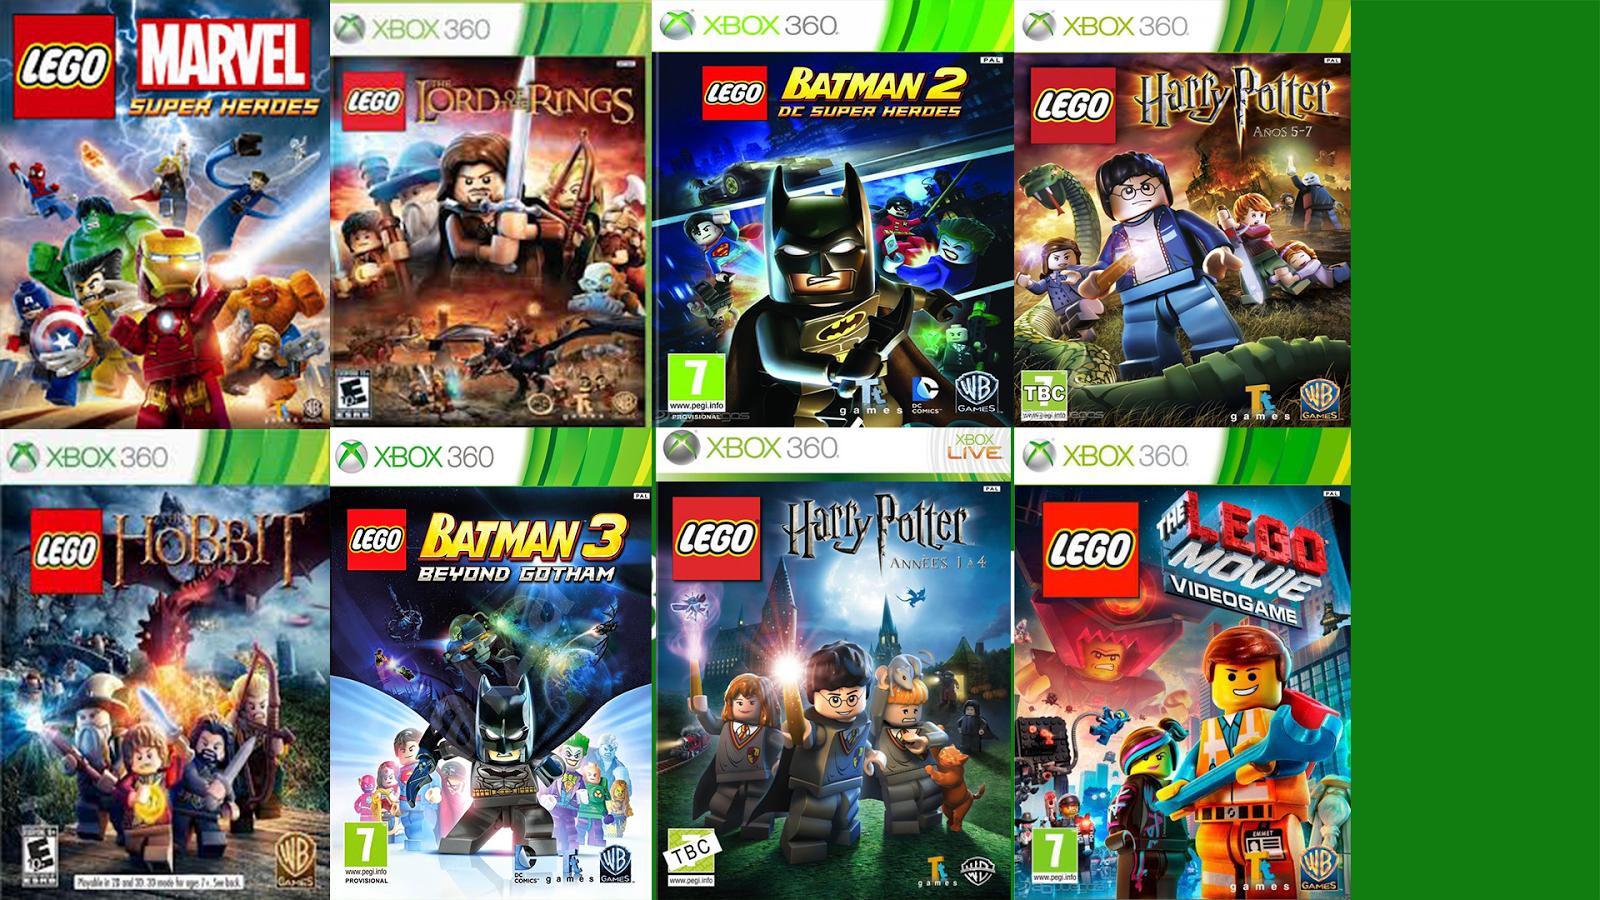 Gamer To Gamers Xbox Store Descuentos Juegos Lego Usuarios Gold